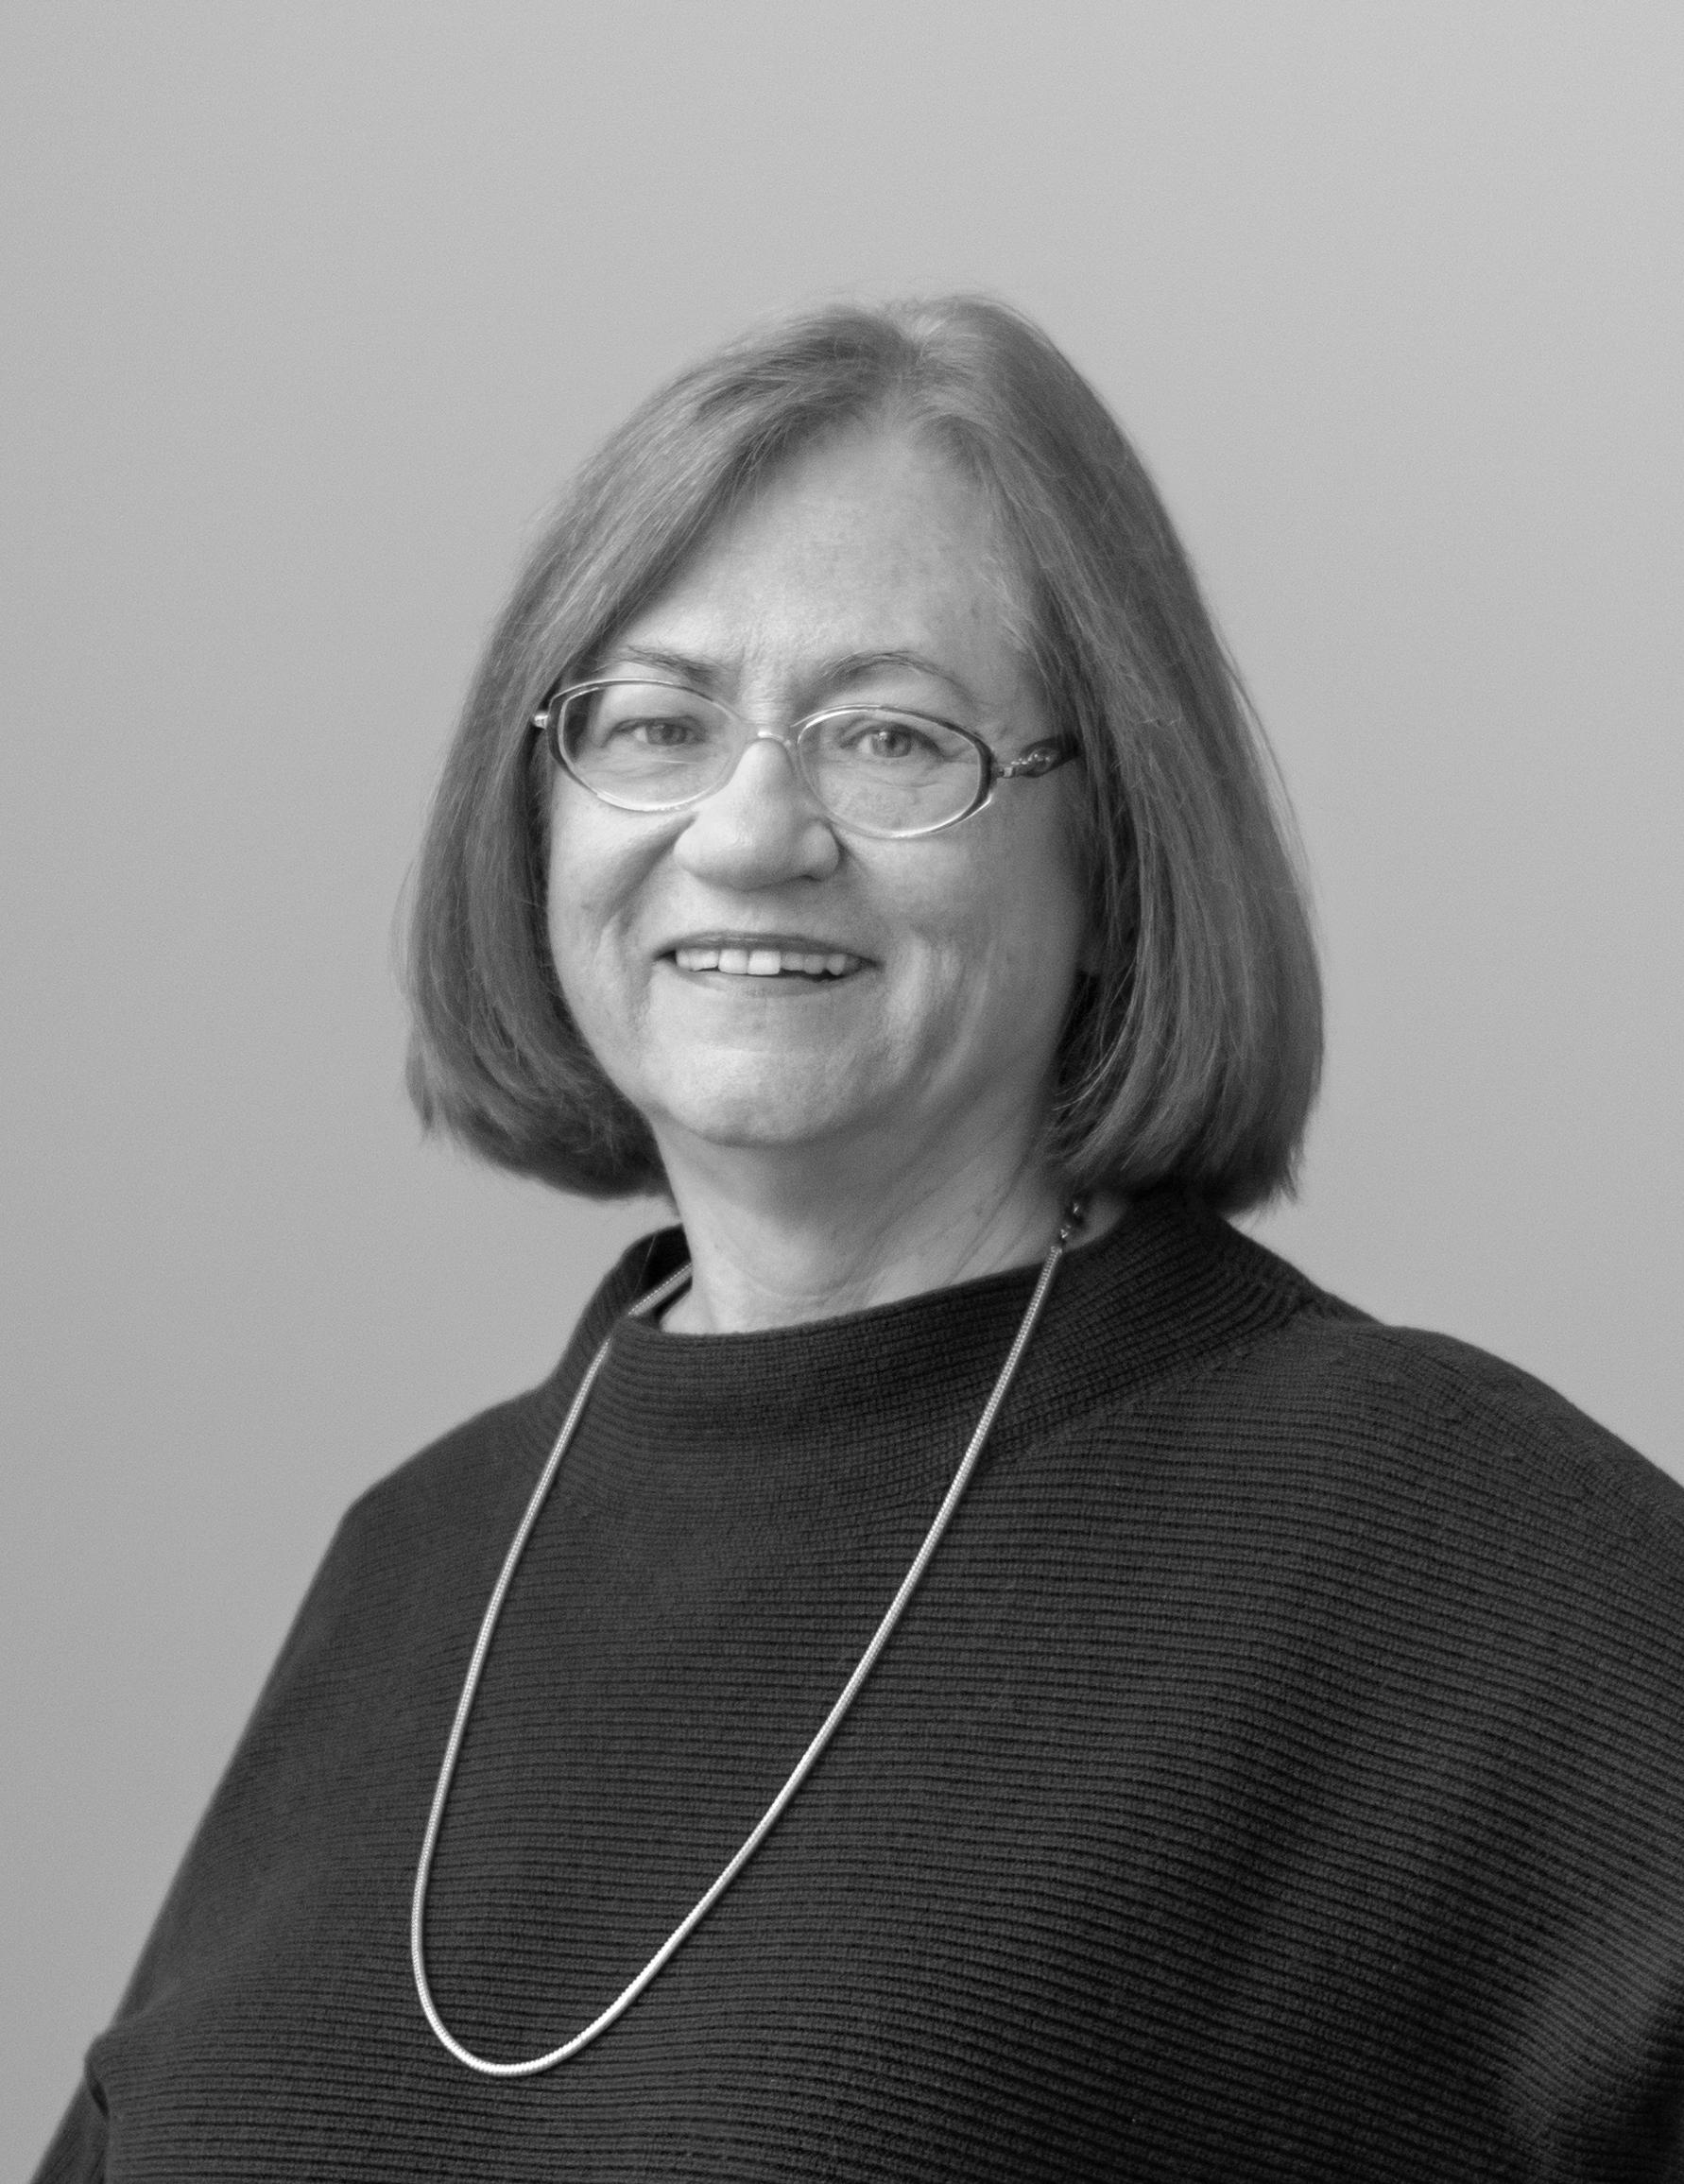 Patricia Downes